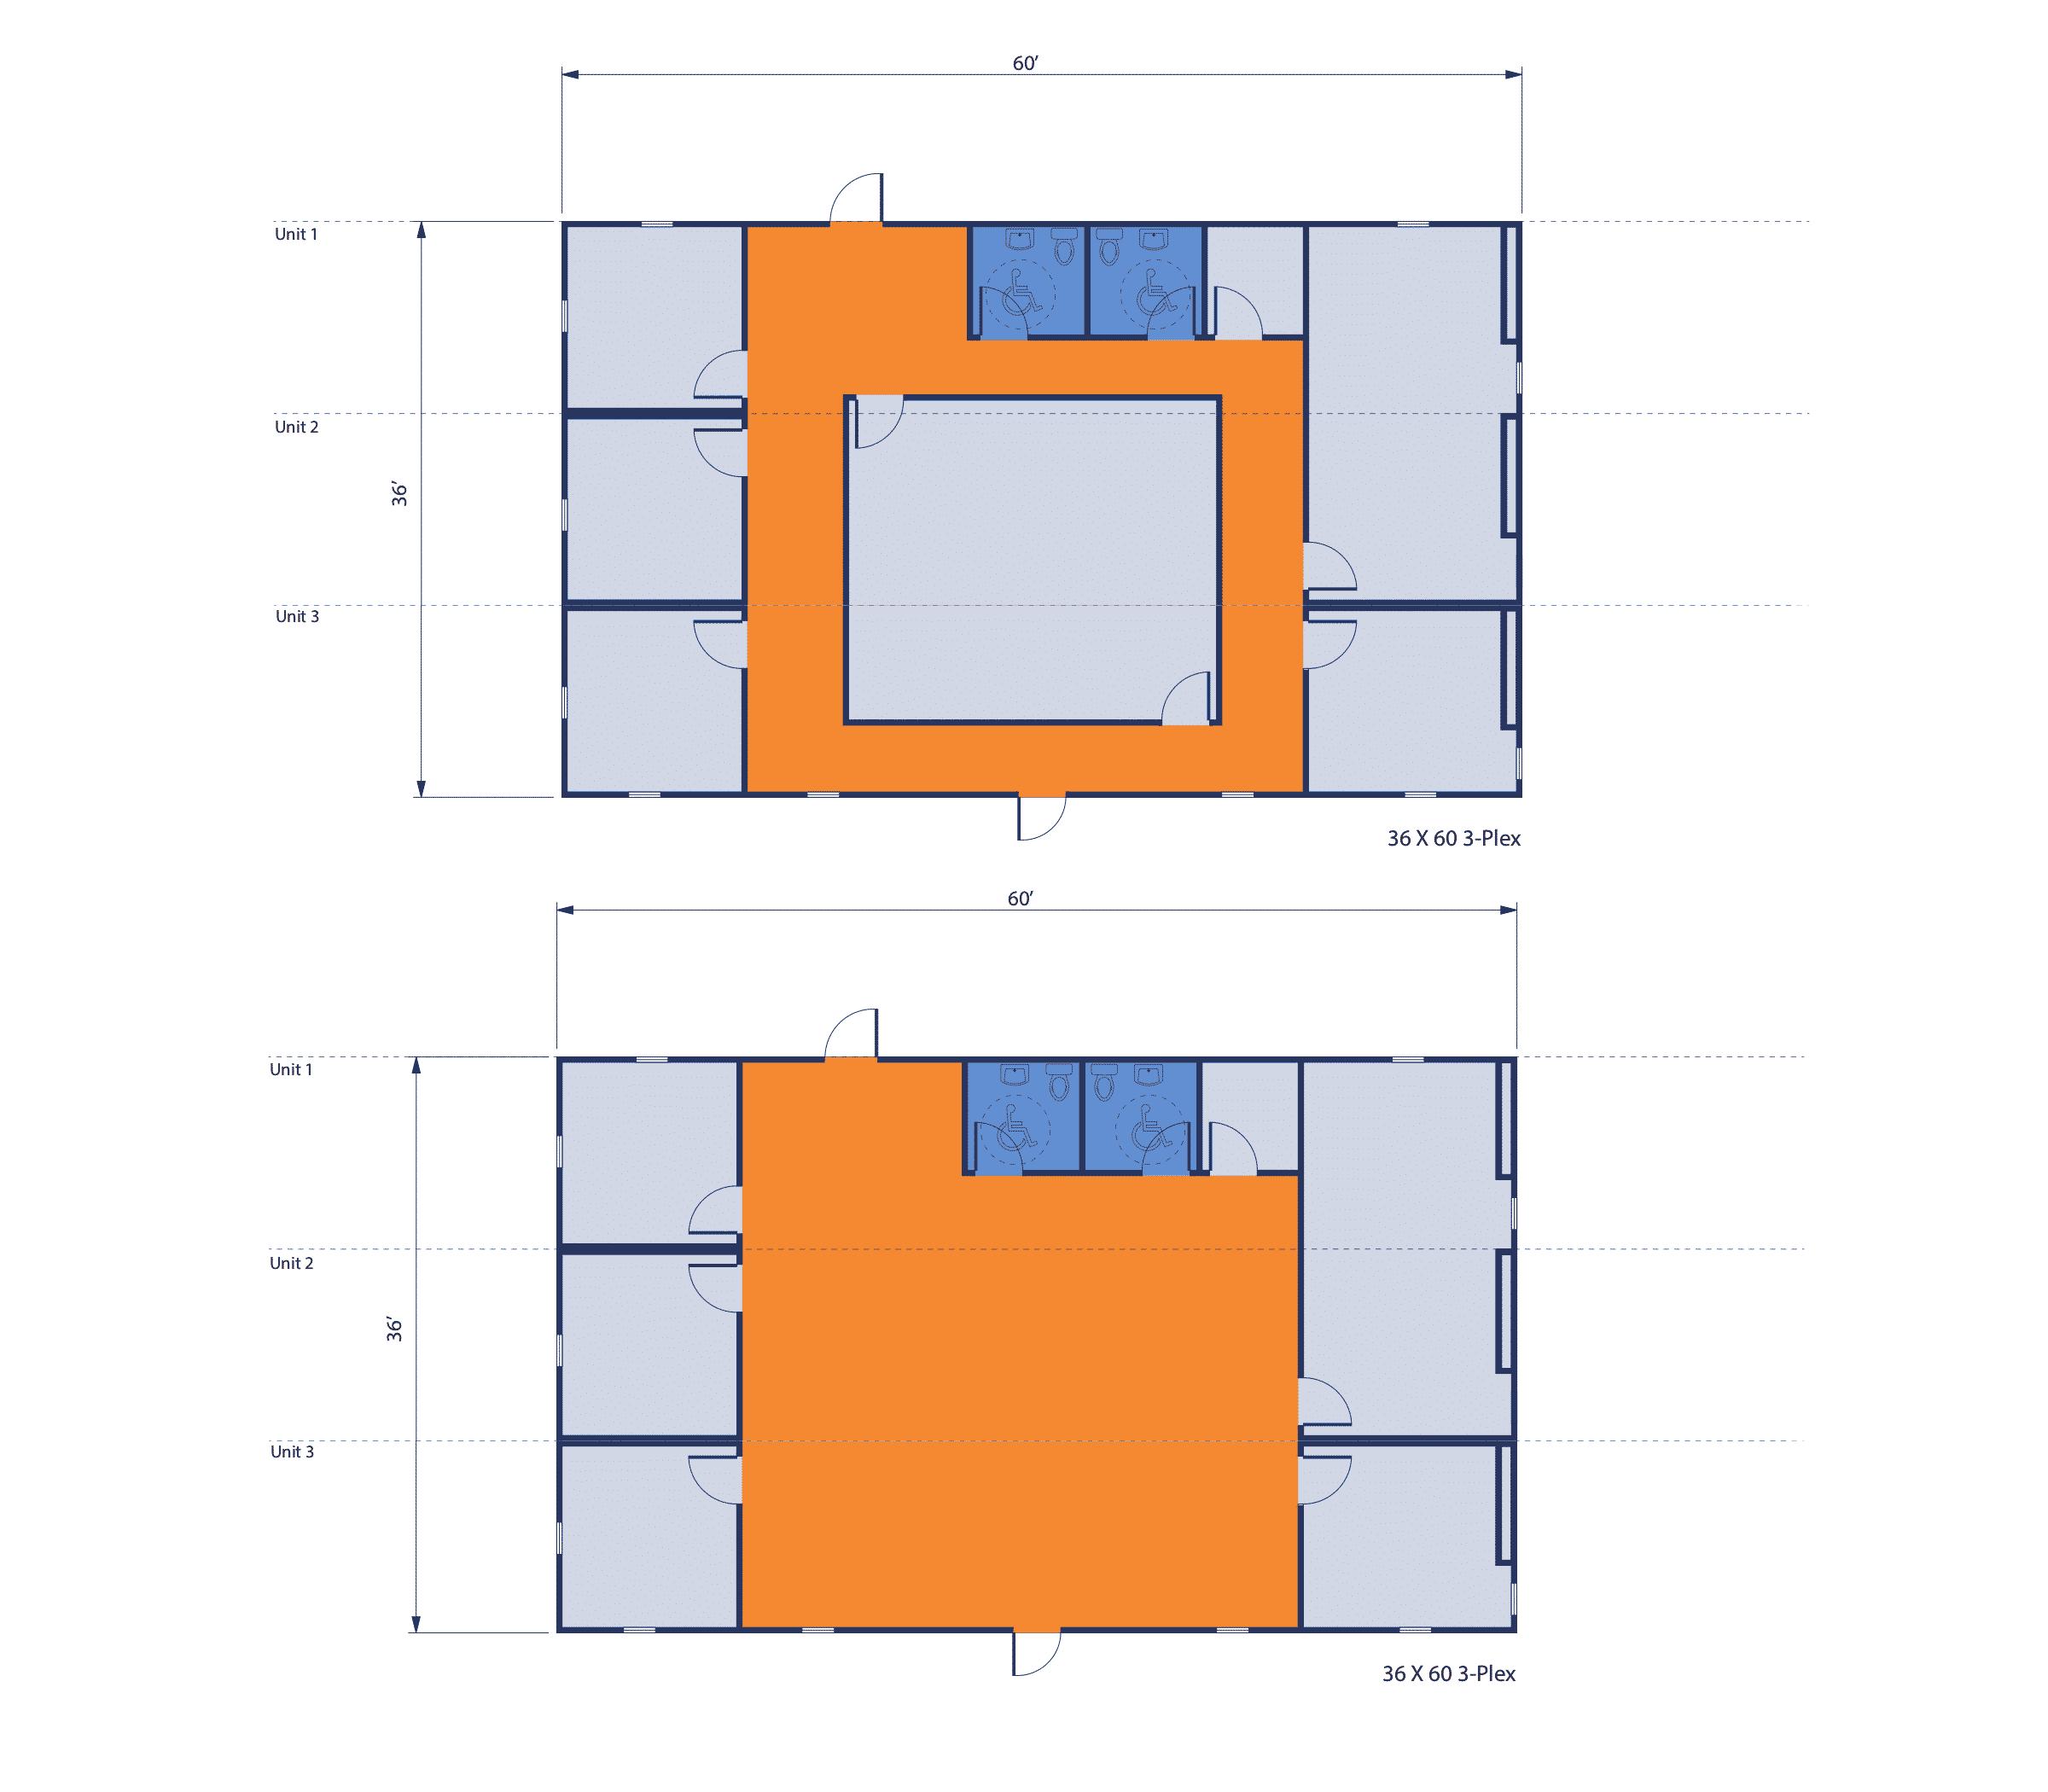 36' x 60' 3-plex modular office complex